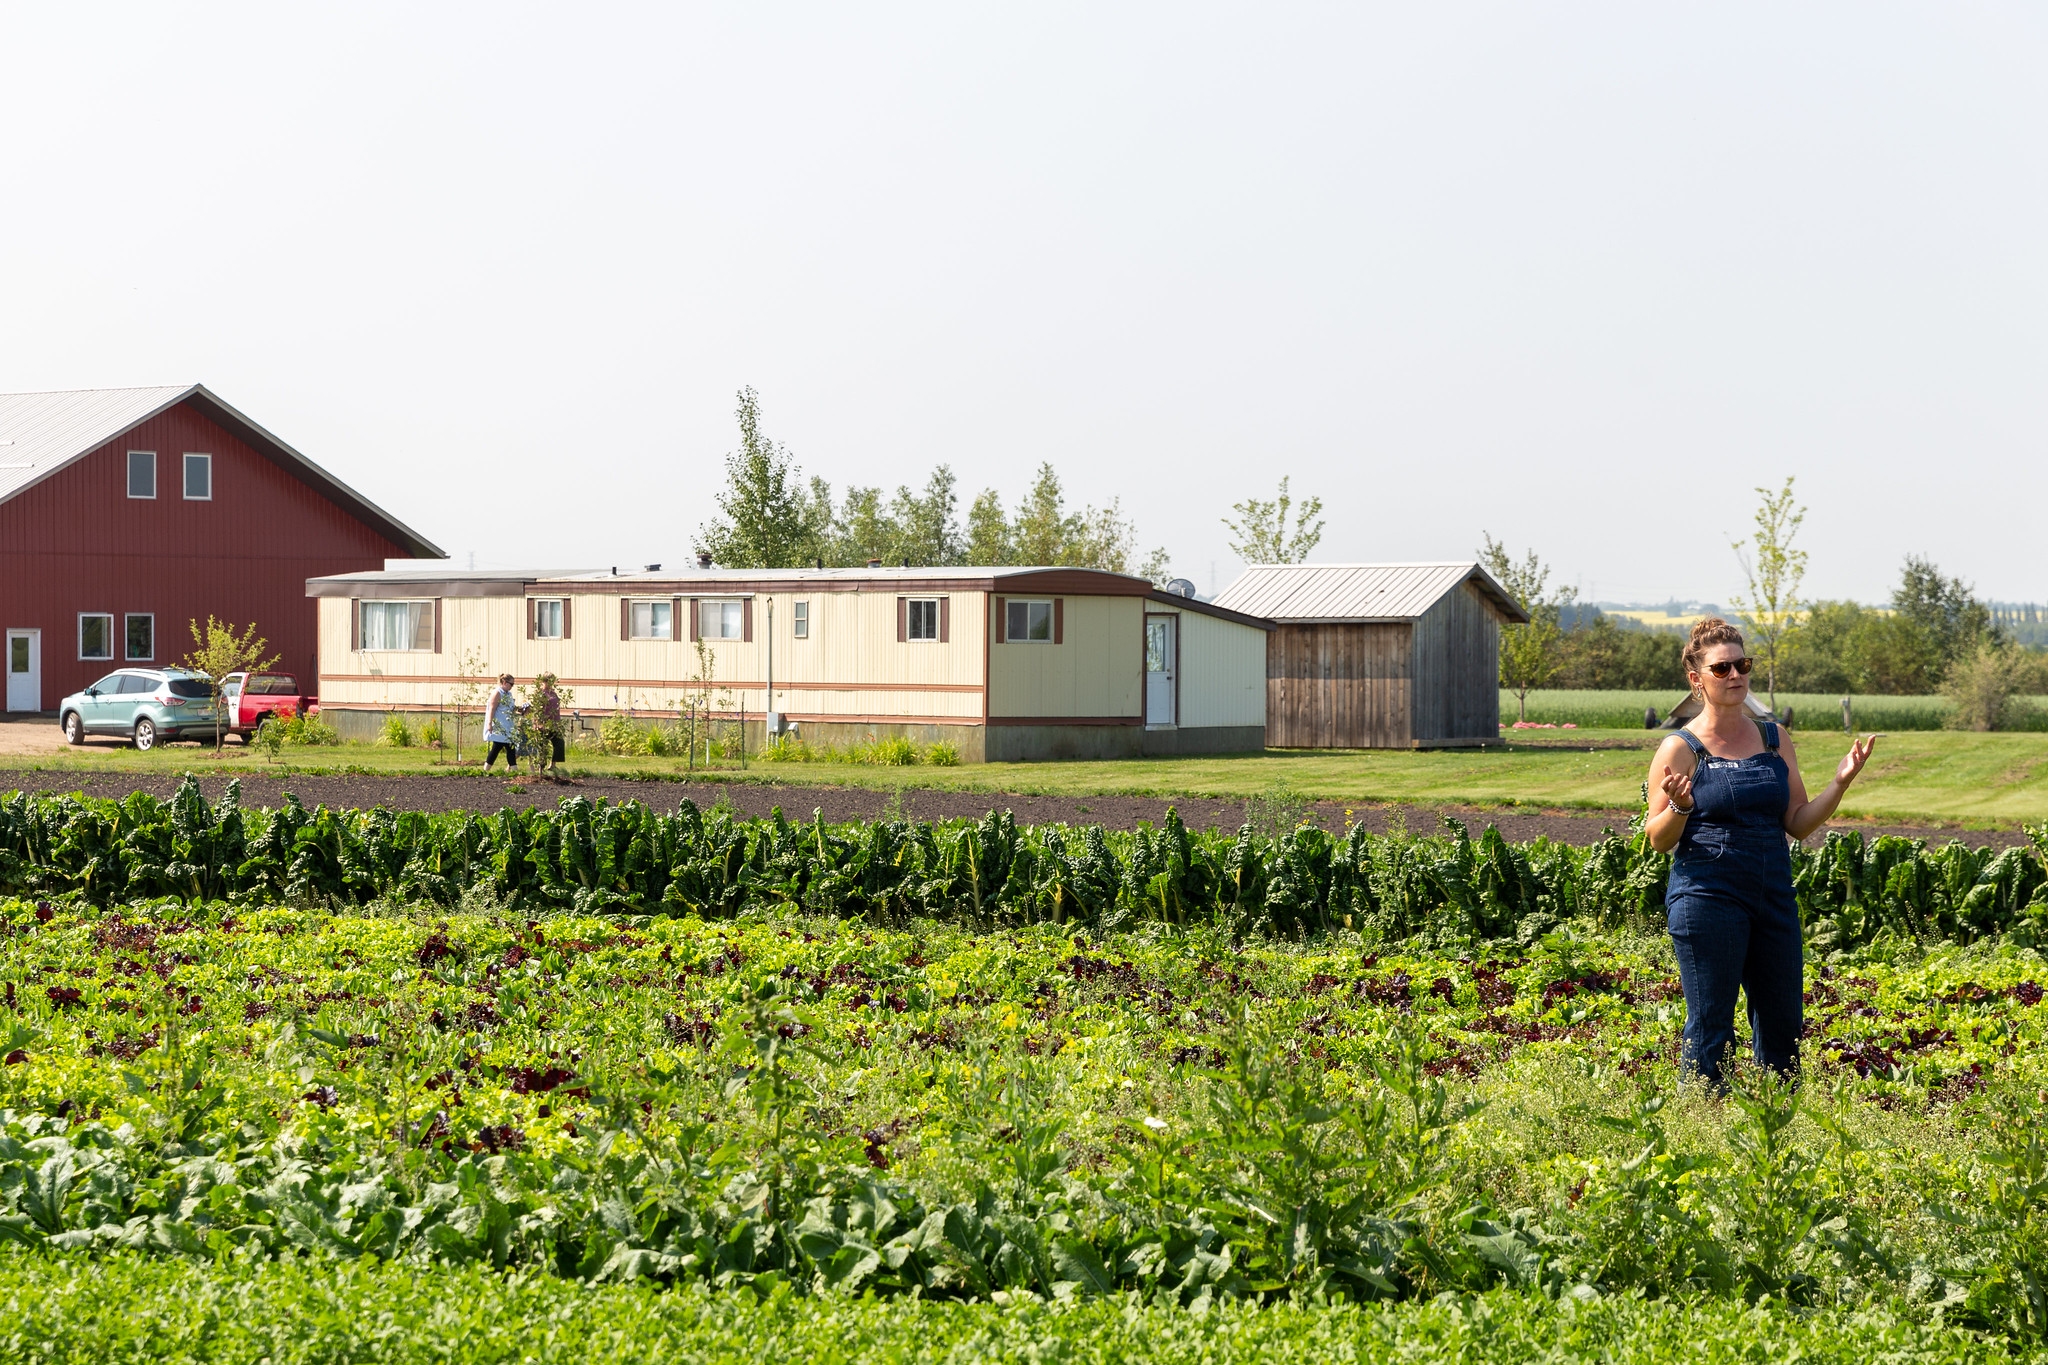 Jenny Berkenbosch of Sundog Organic Farm giving a tour of her farm in July 2018. Photo by Mack Male.